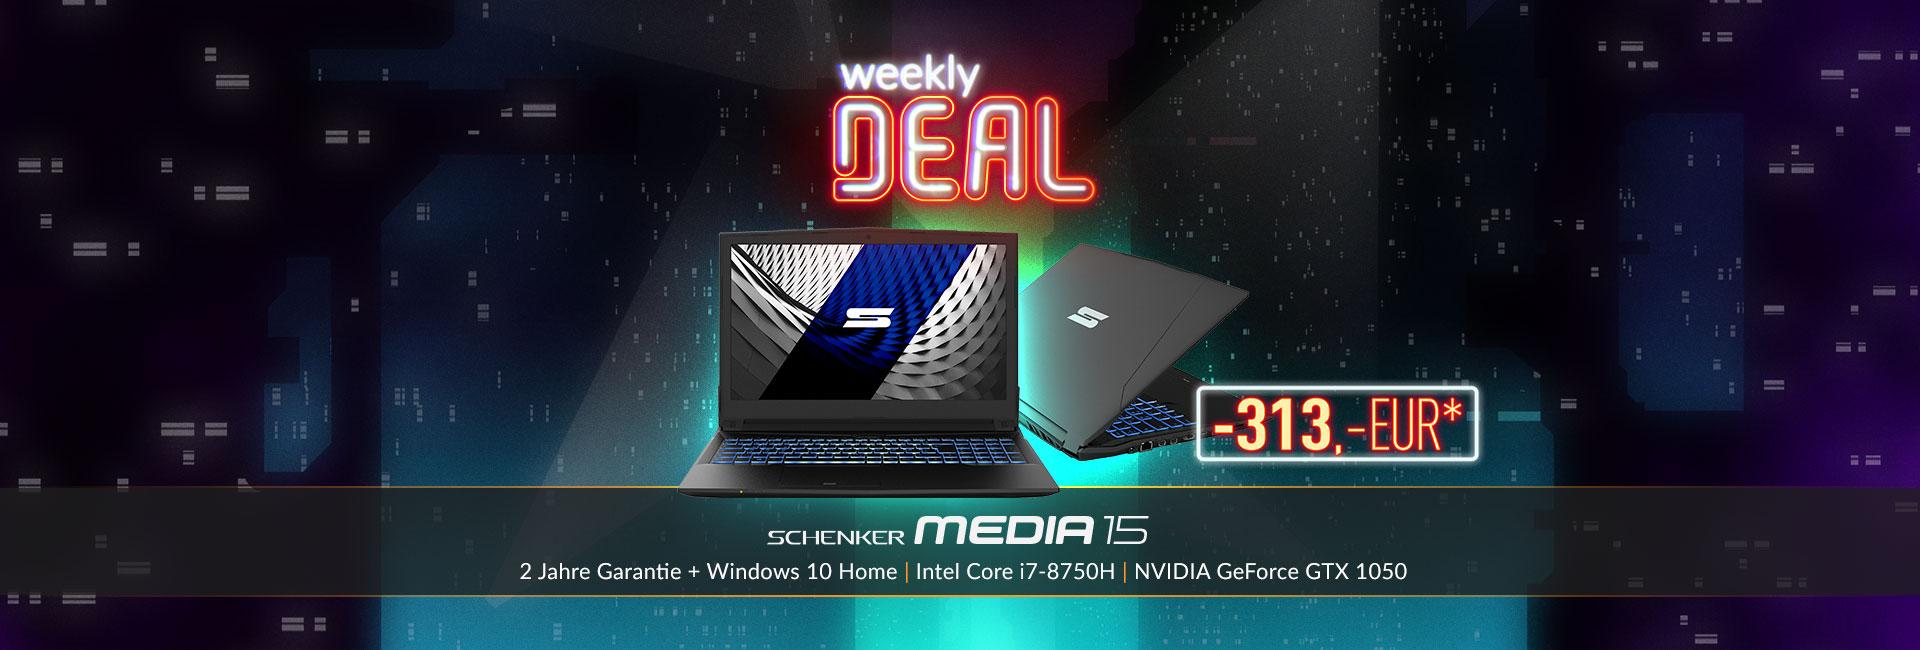 Weekly Deal